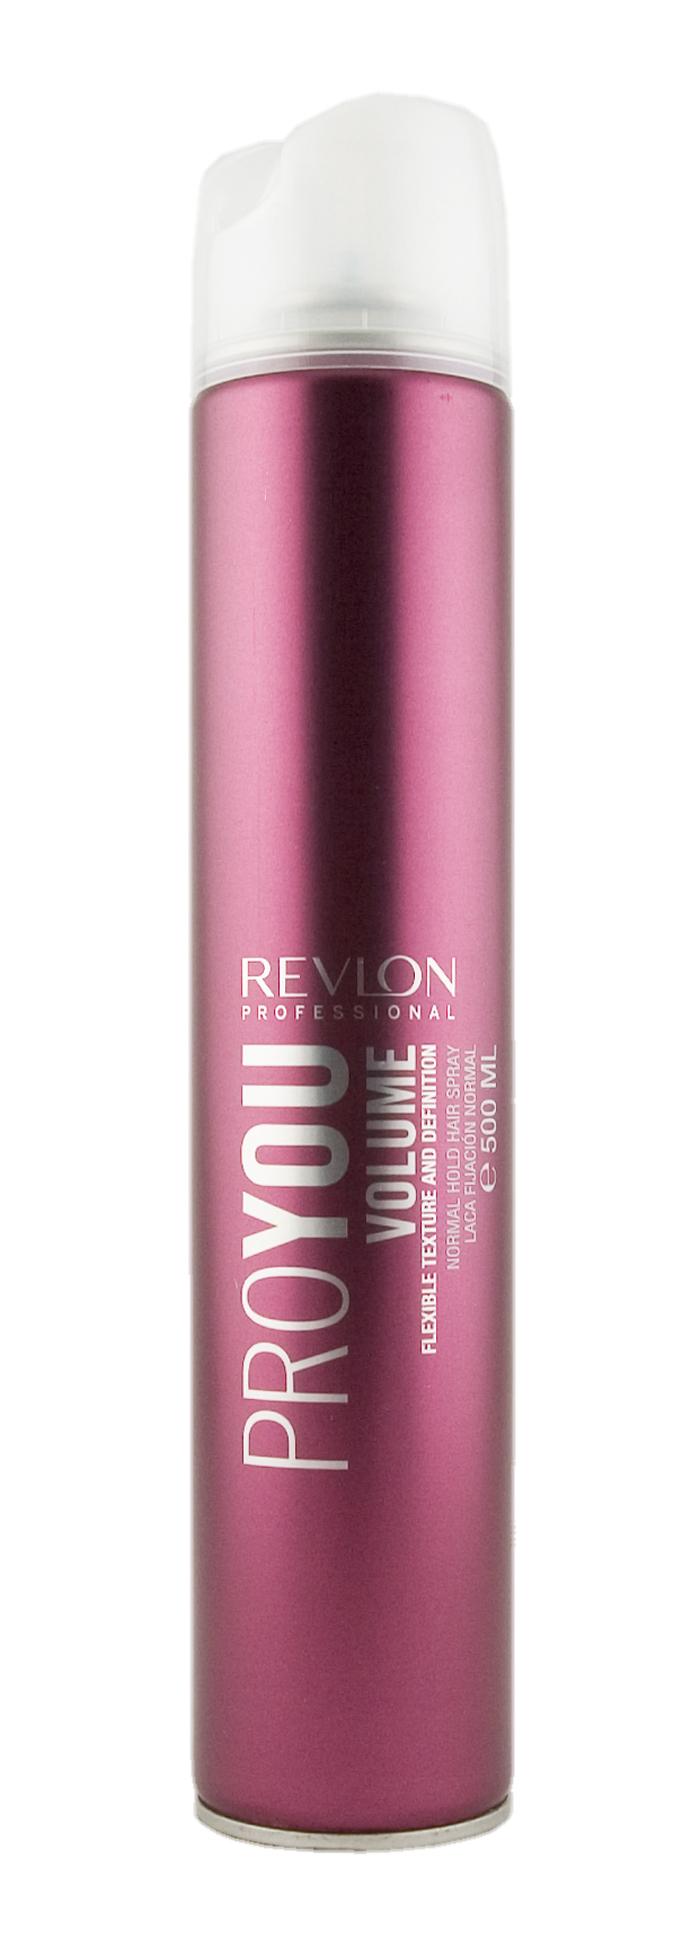 Revlon Professional Pro You Volume Hair Spray 500 ml